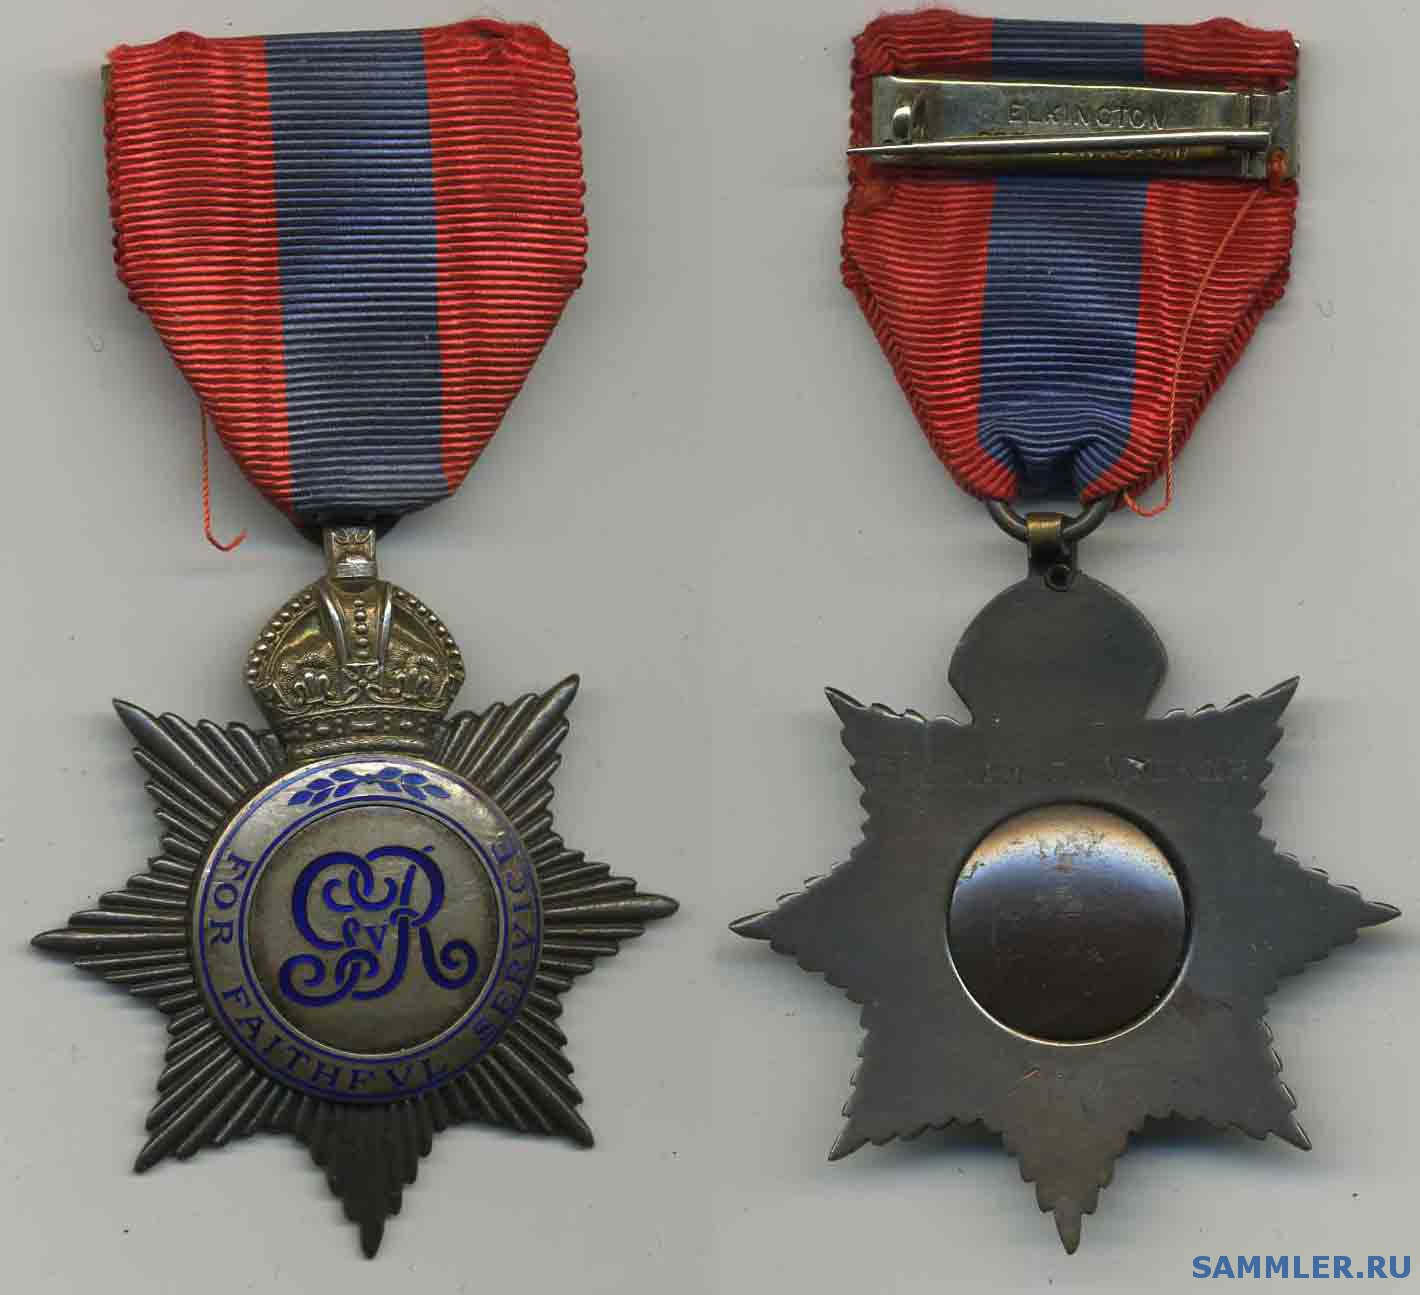 Imperial_Service_Medal1.jpg